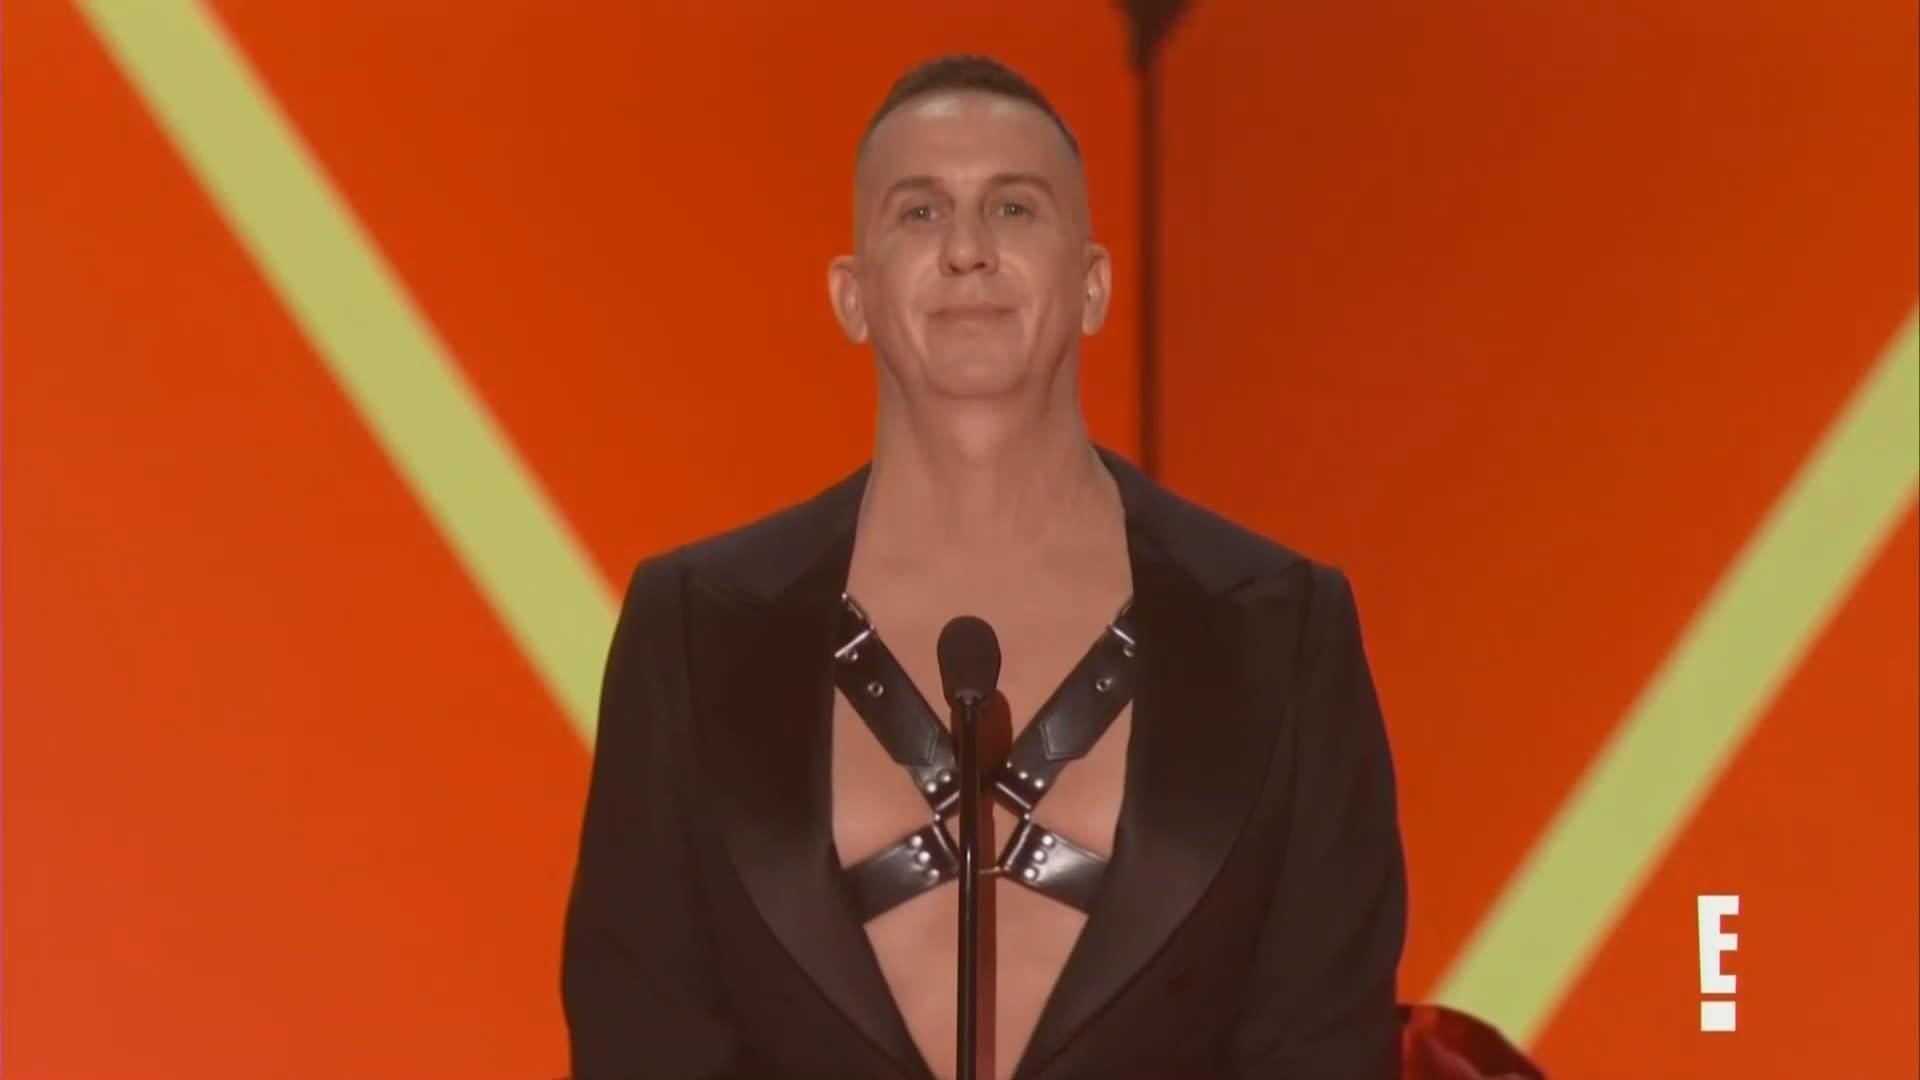 Fashion designer's awkward moment presenting Gwen Stefani with Fashion Icon Award